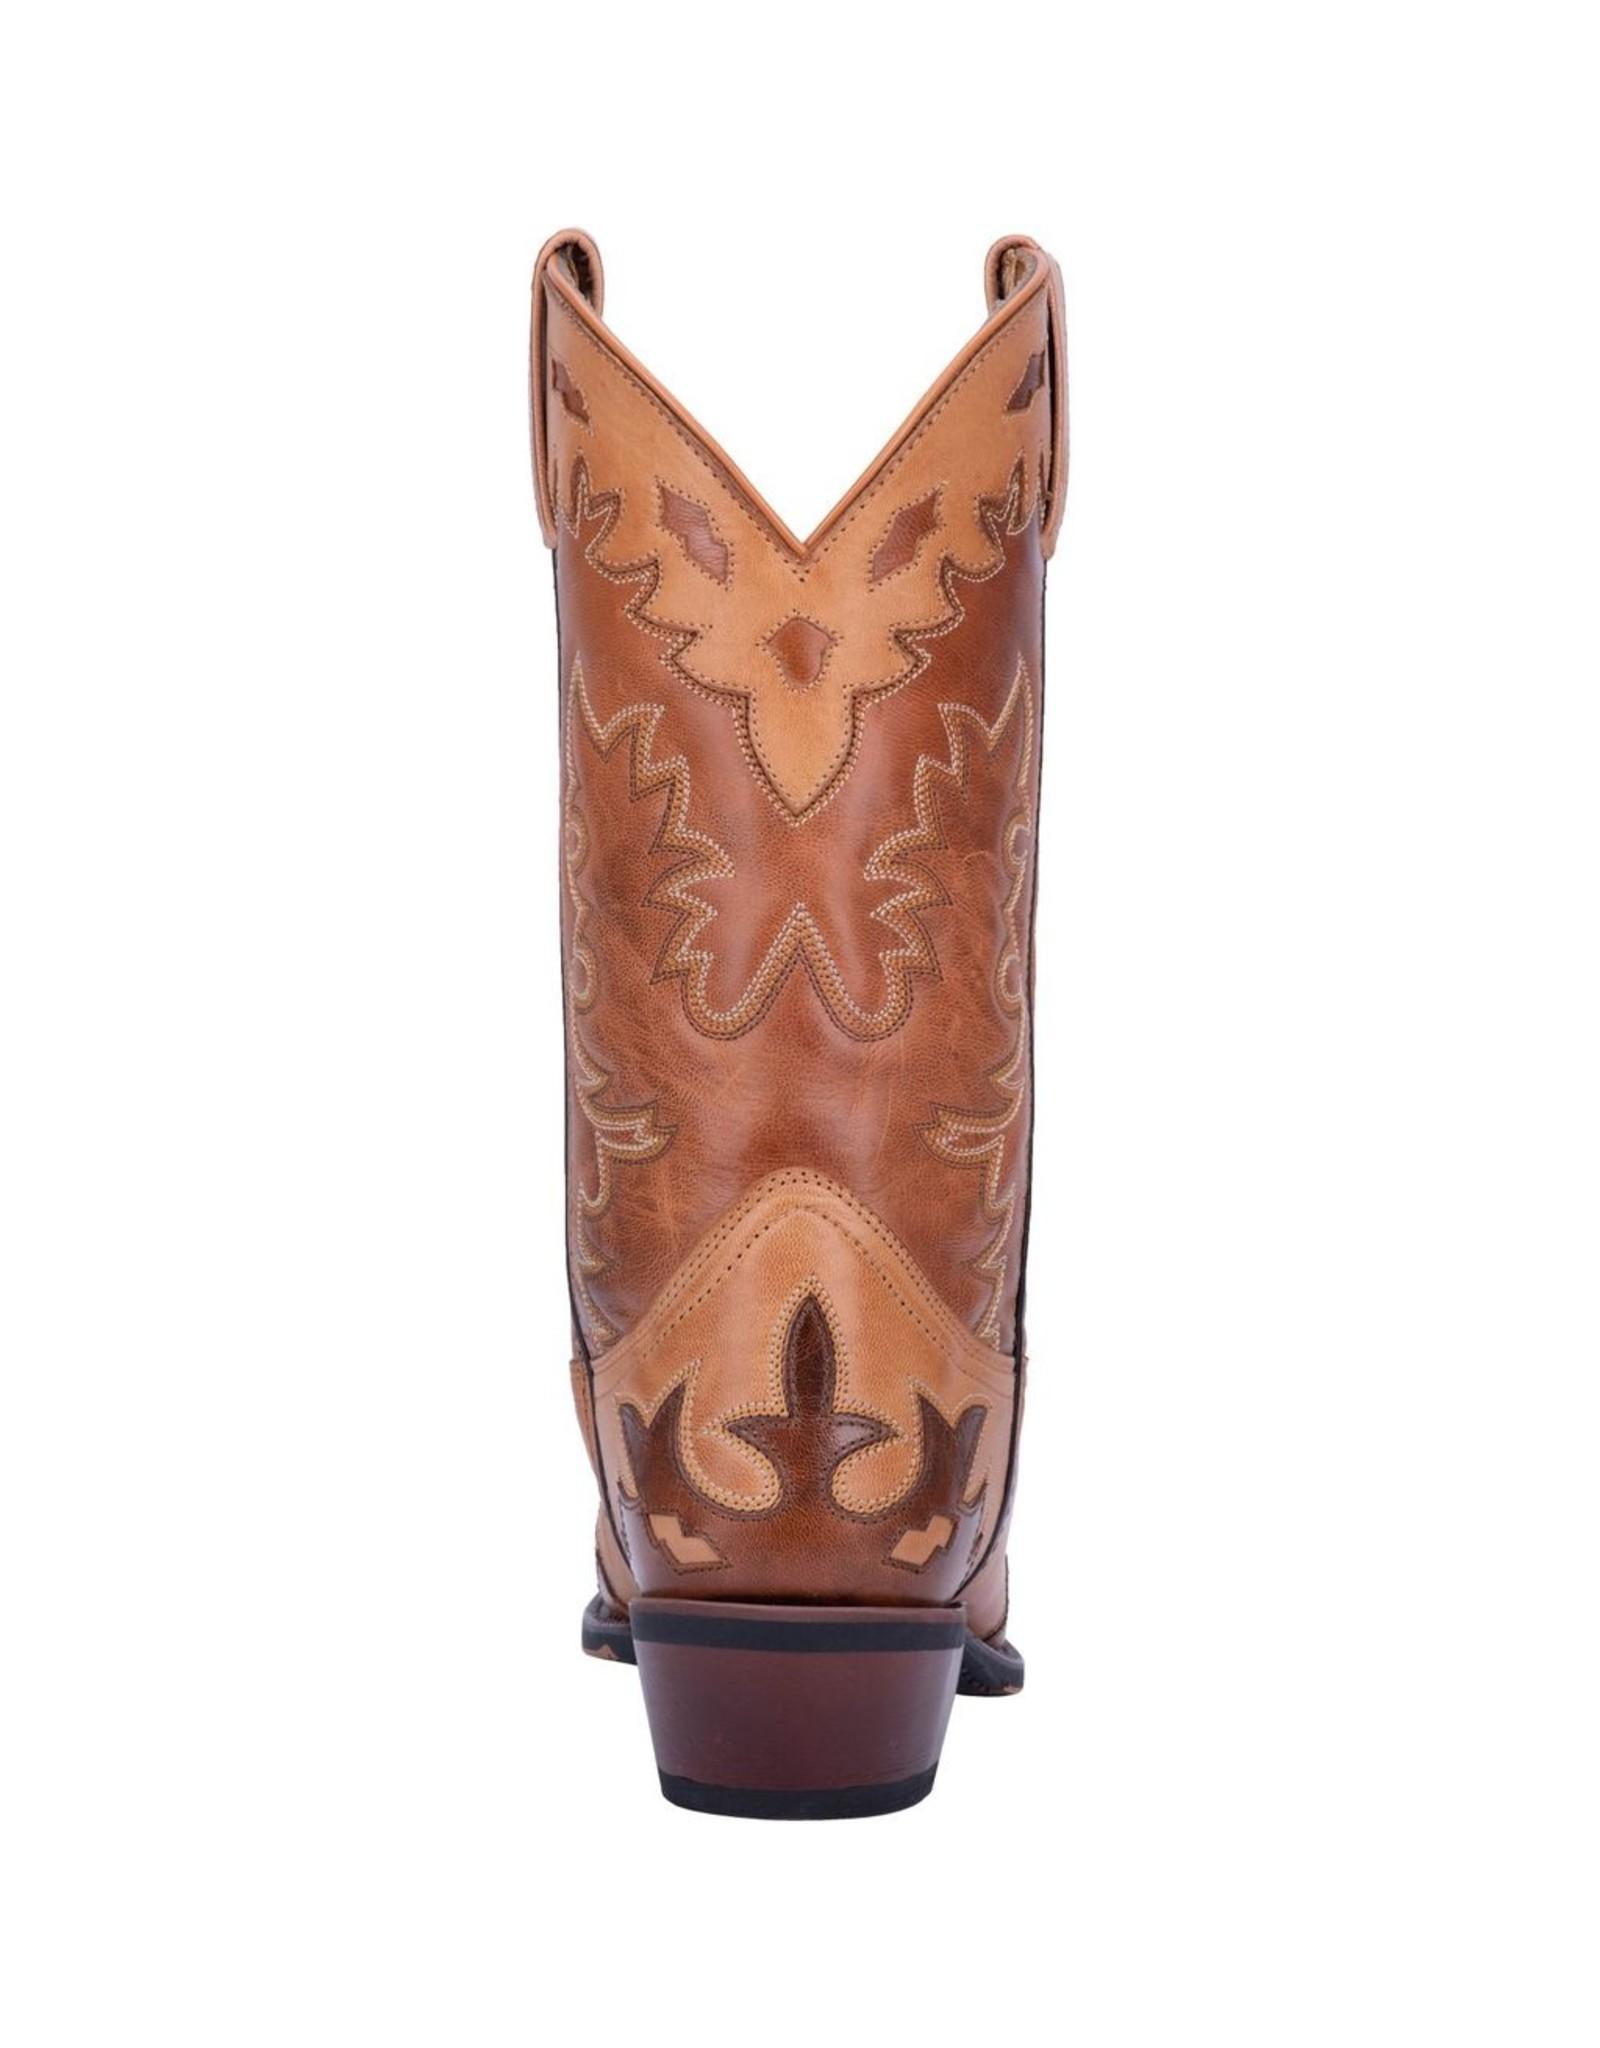 Boots-Men Laredo 6765 Nash 12��� Antique Tan Snip Toe